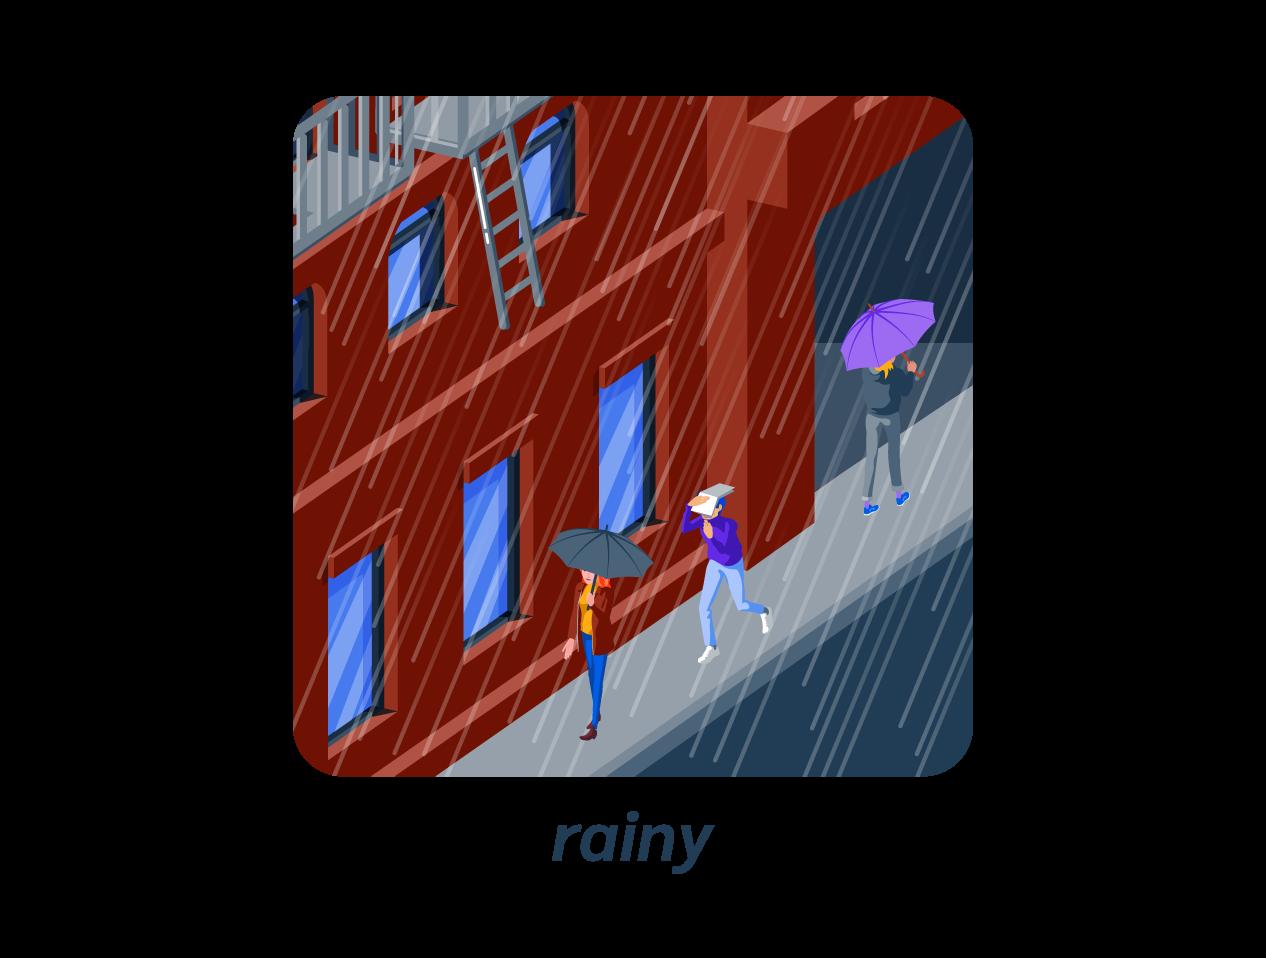 rainy pluie anglais météo weather